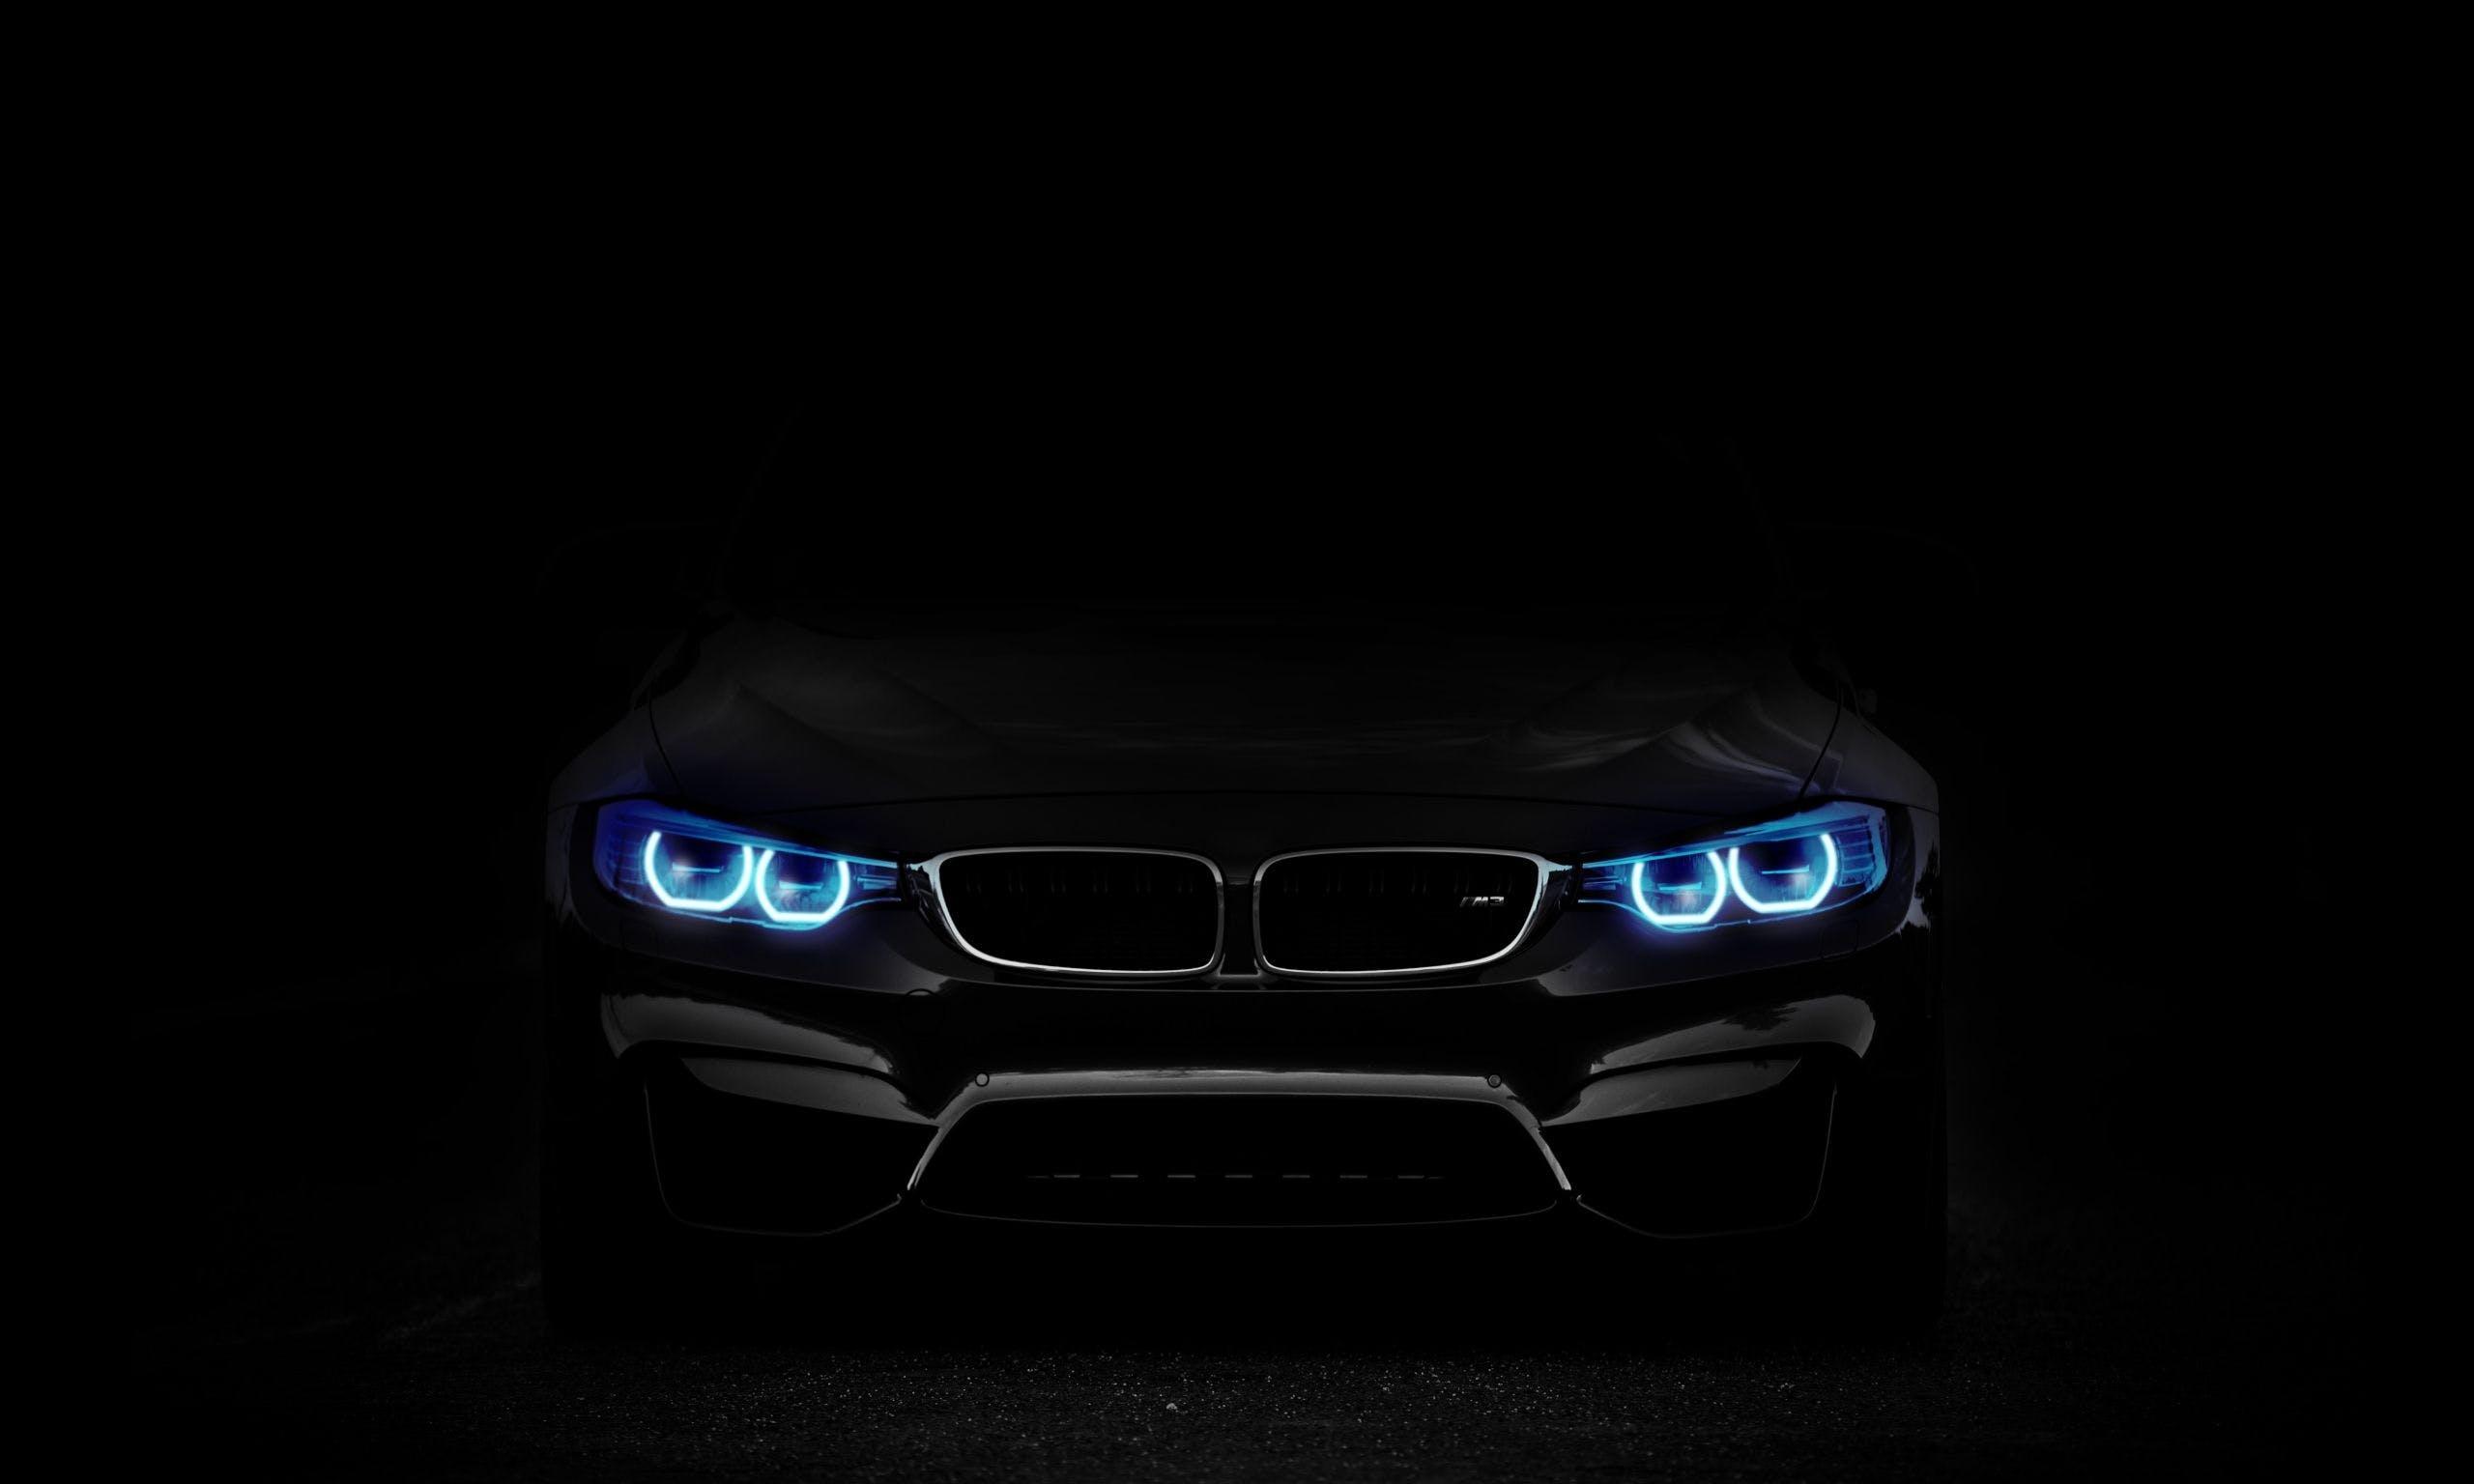 Wallpaper : black, BMW, blue 2560x1536 - muskratracer ...